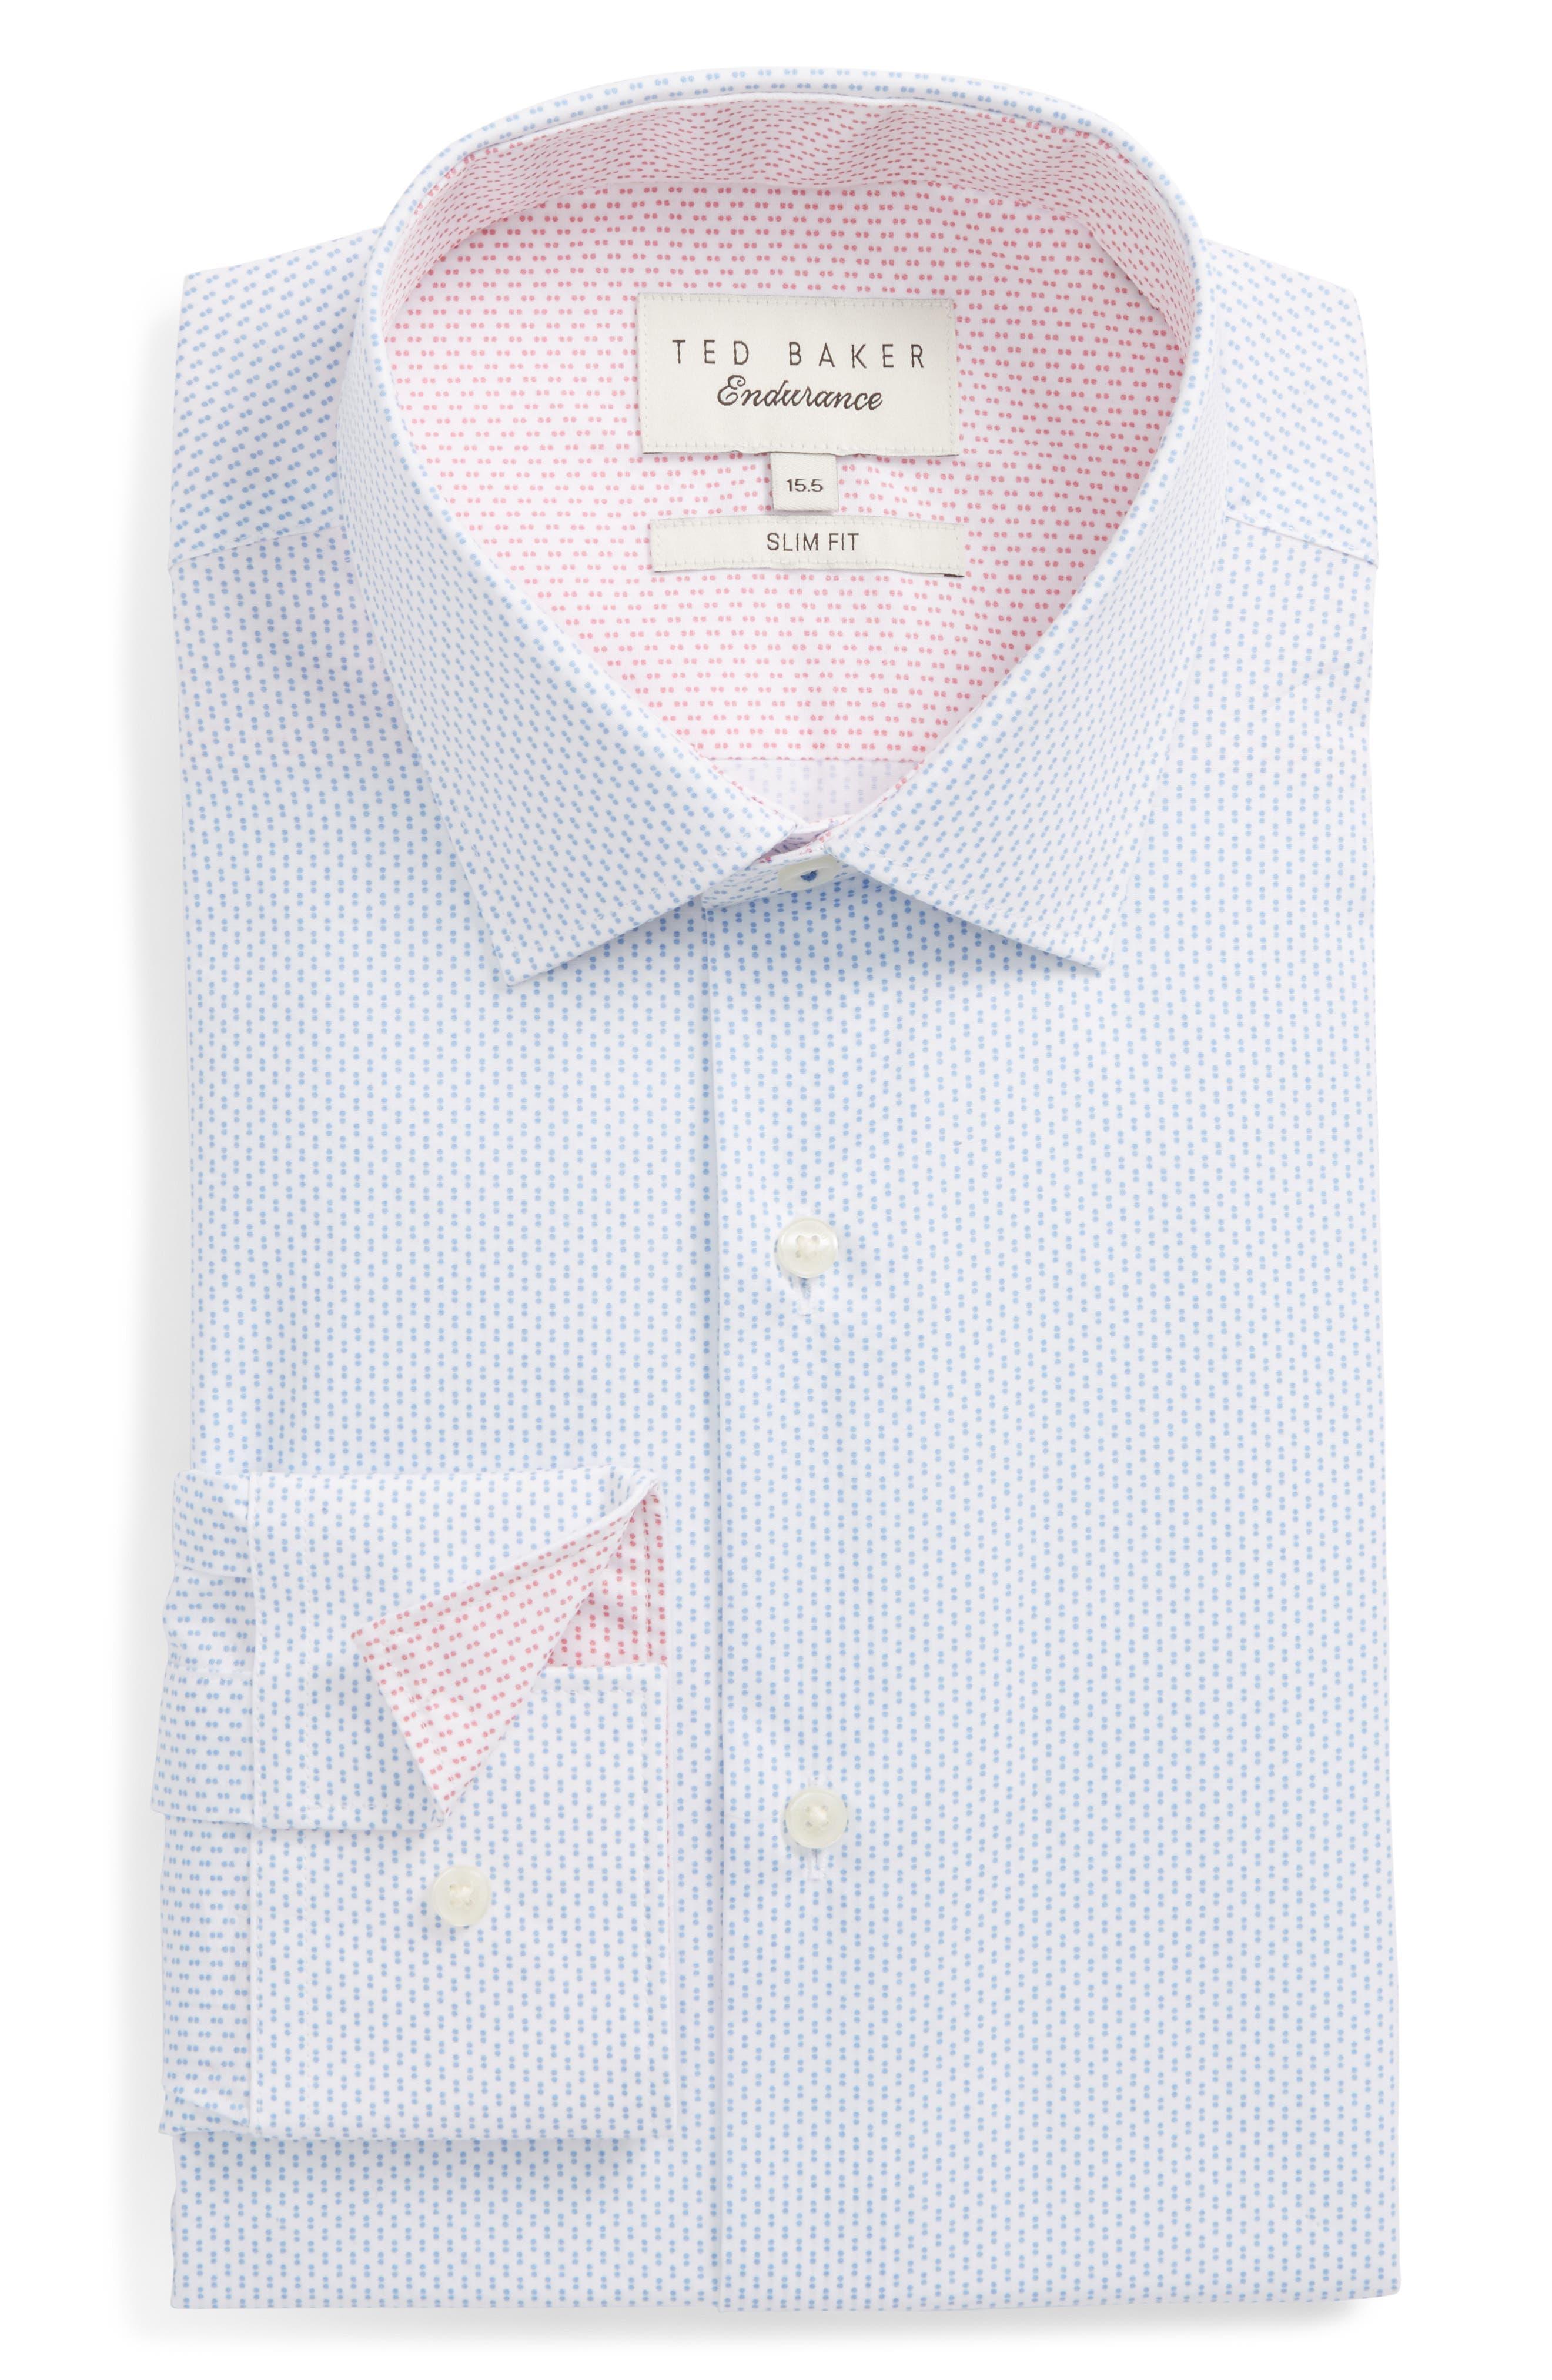 Endurance Barged Slim Fit Double Dot Dress Shirt,                             Main thumbnail 1, color,